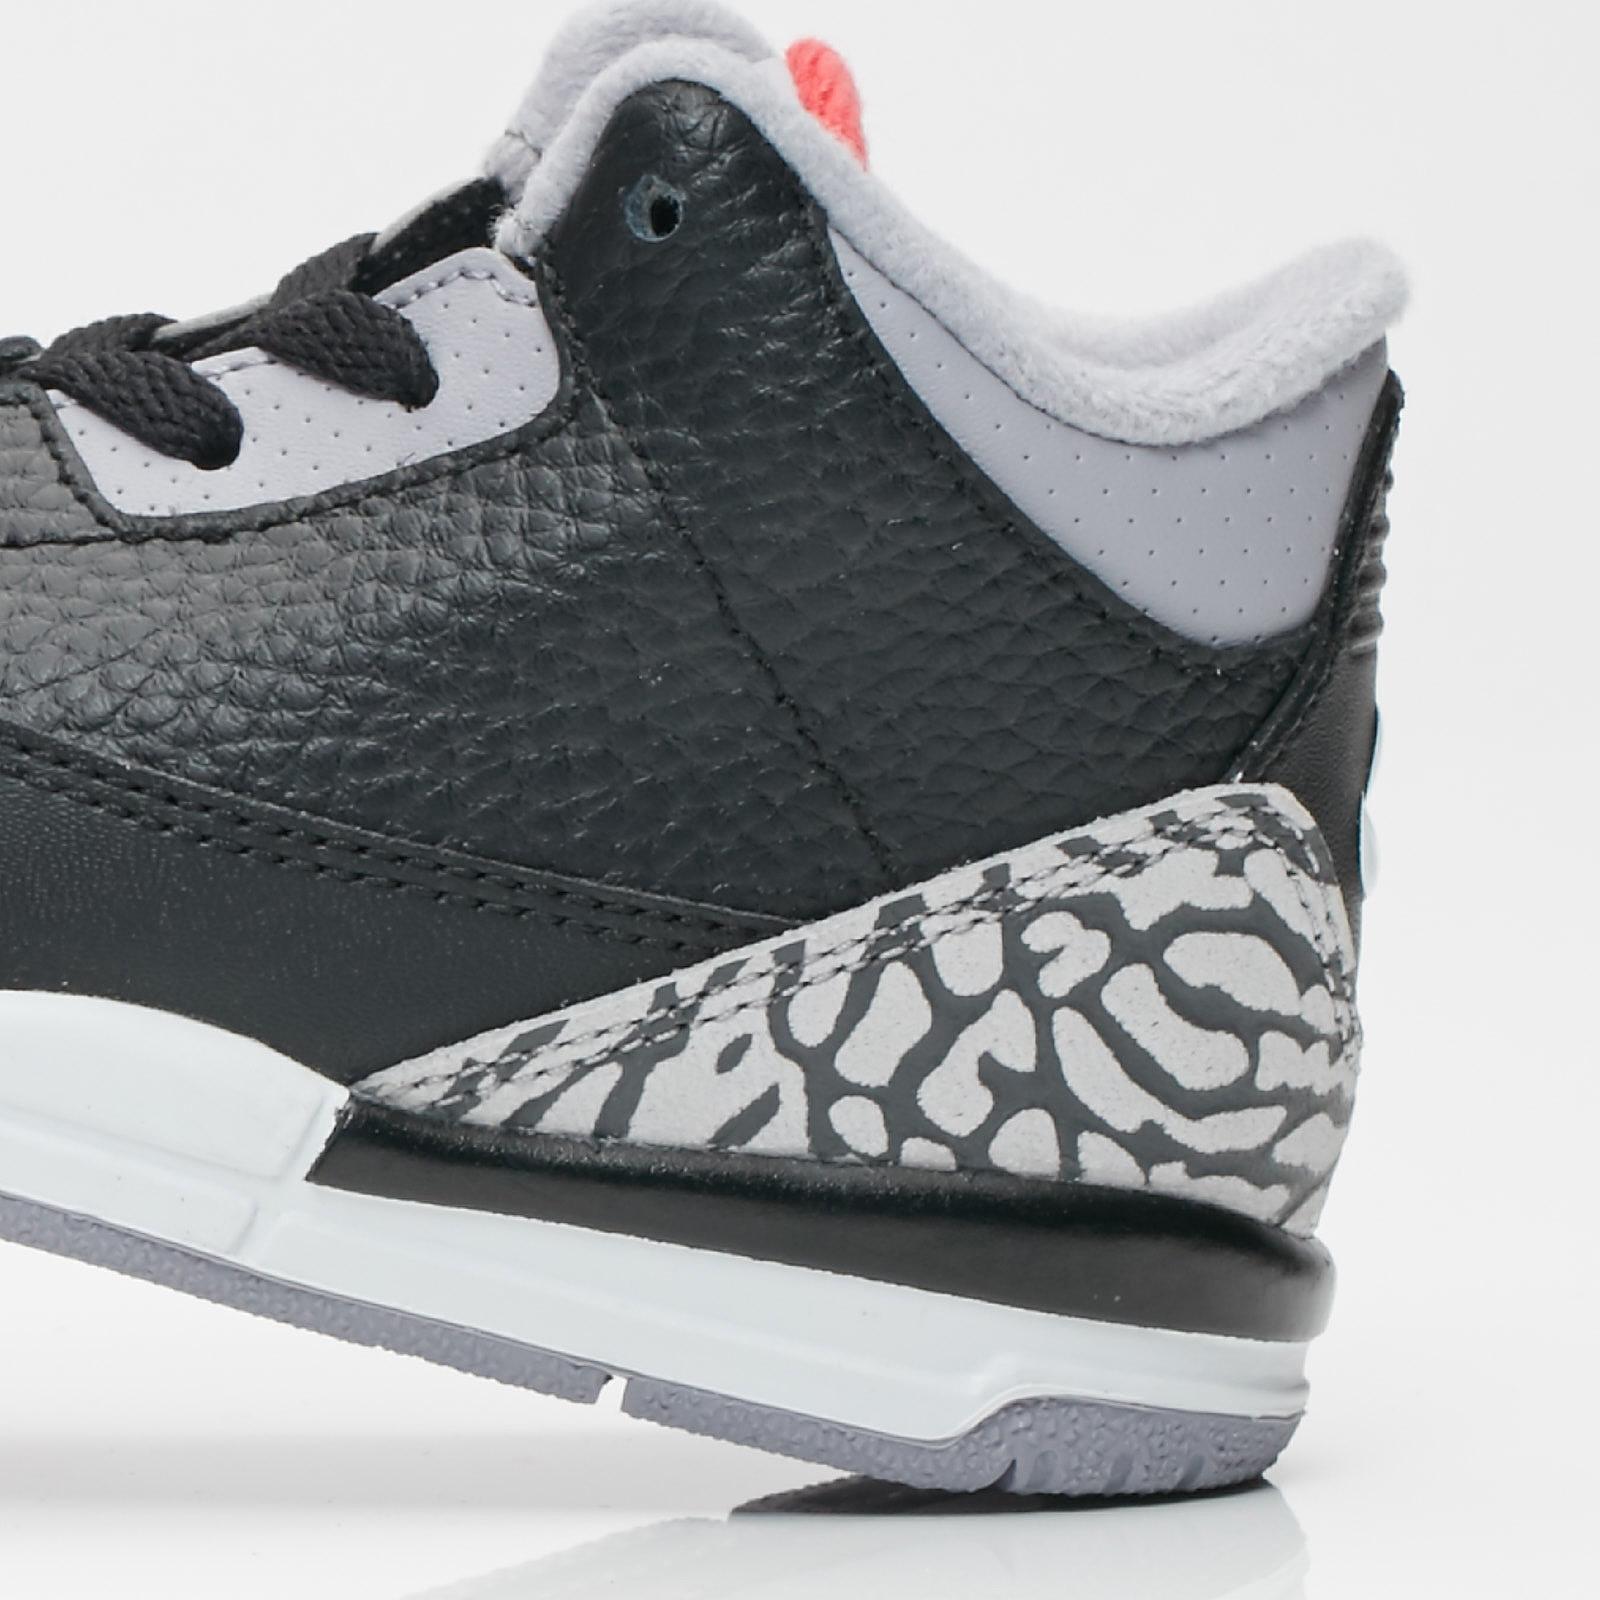 online store 863e0 d1f49 Jordan Brand Air Jordan 3 Retro OG (TD). Close